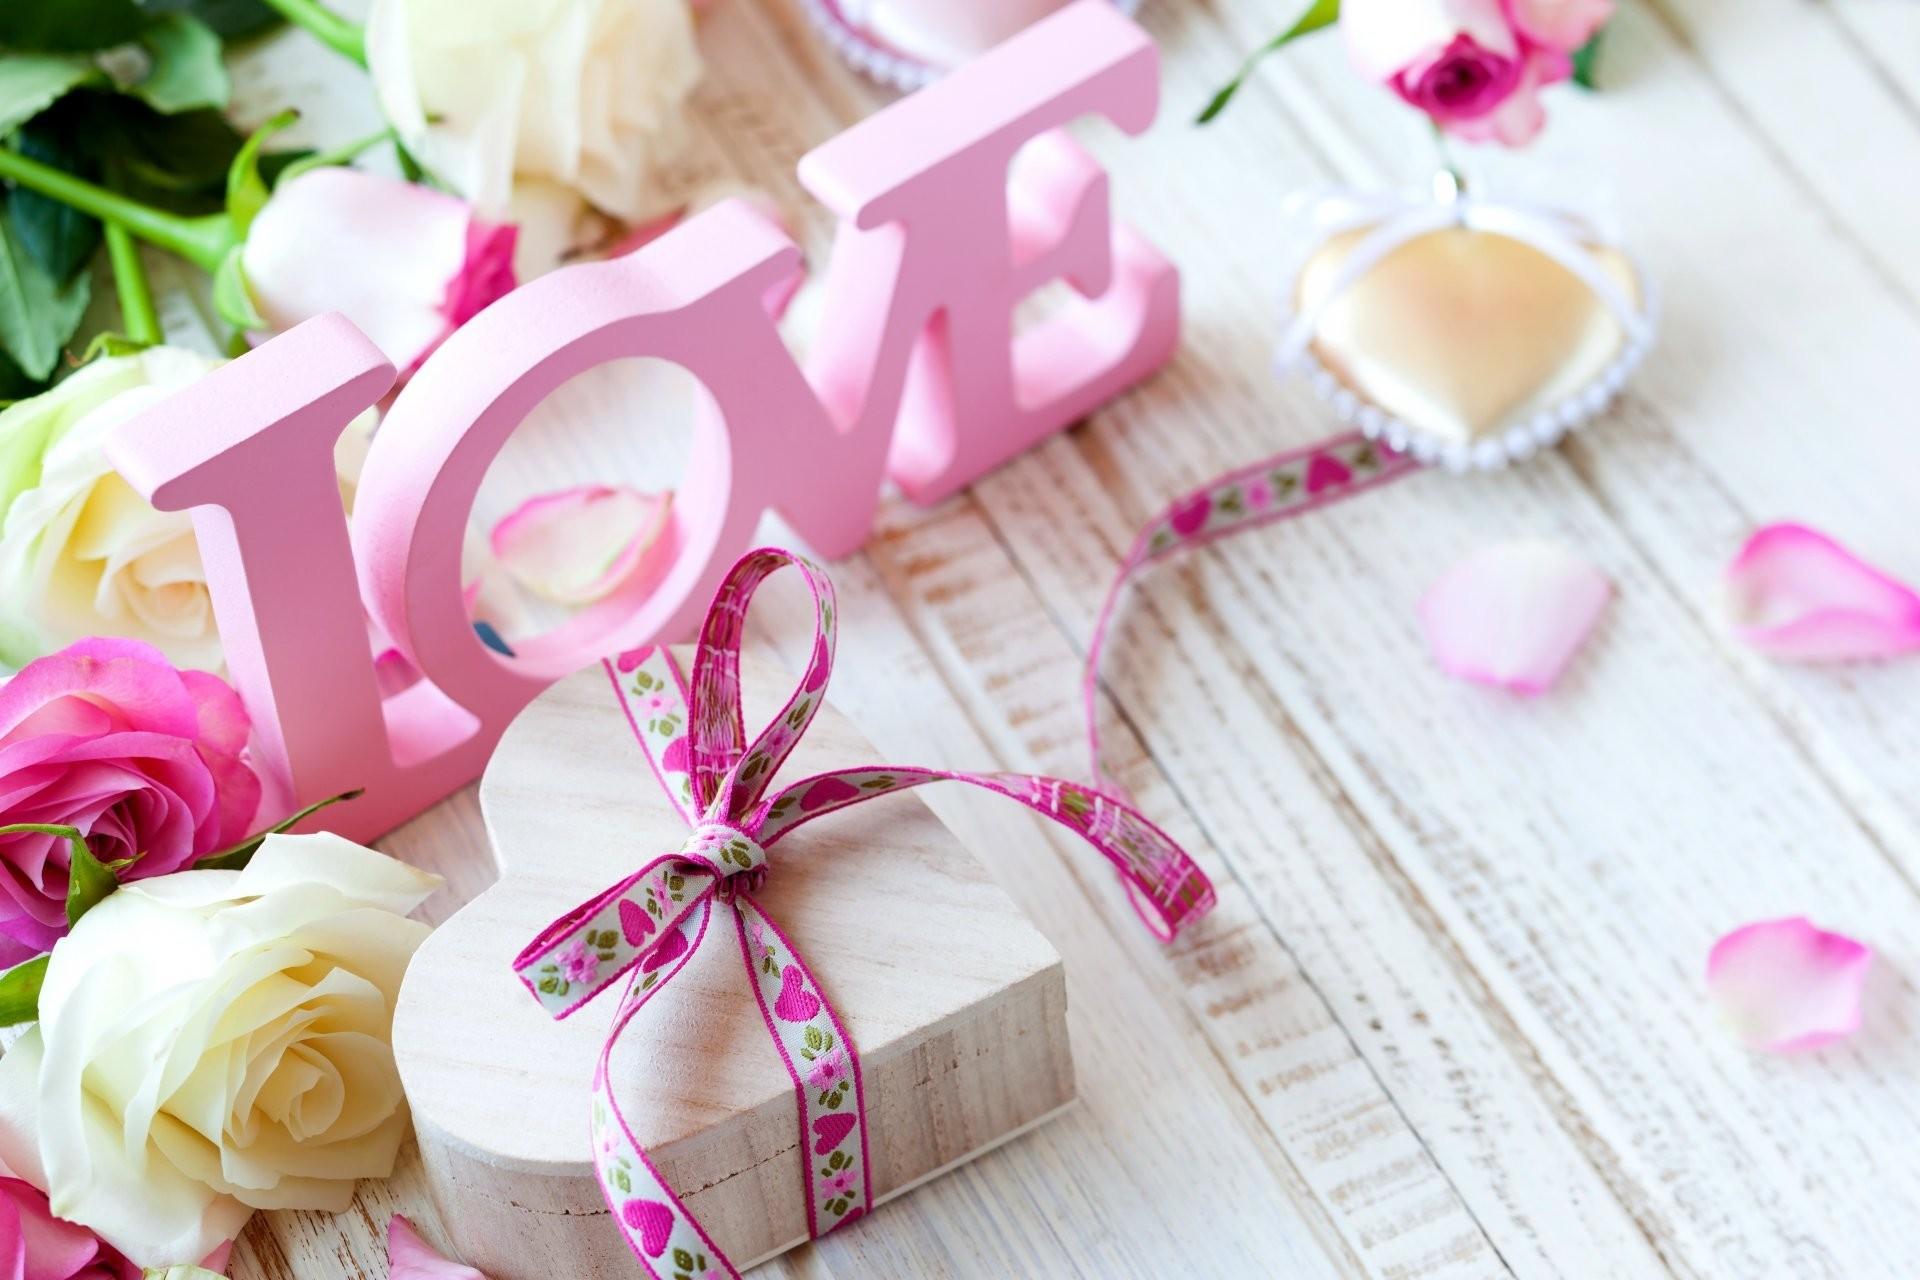 valentine's day romantic heart love rose pink roses heart love romance